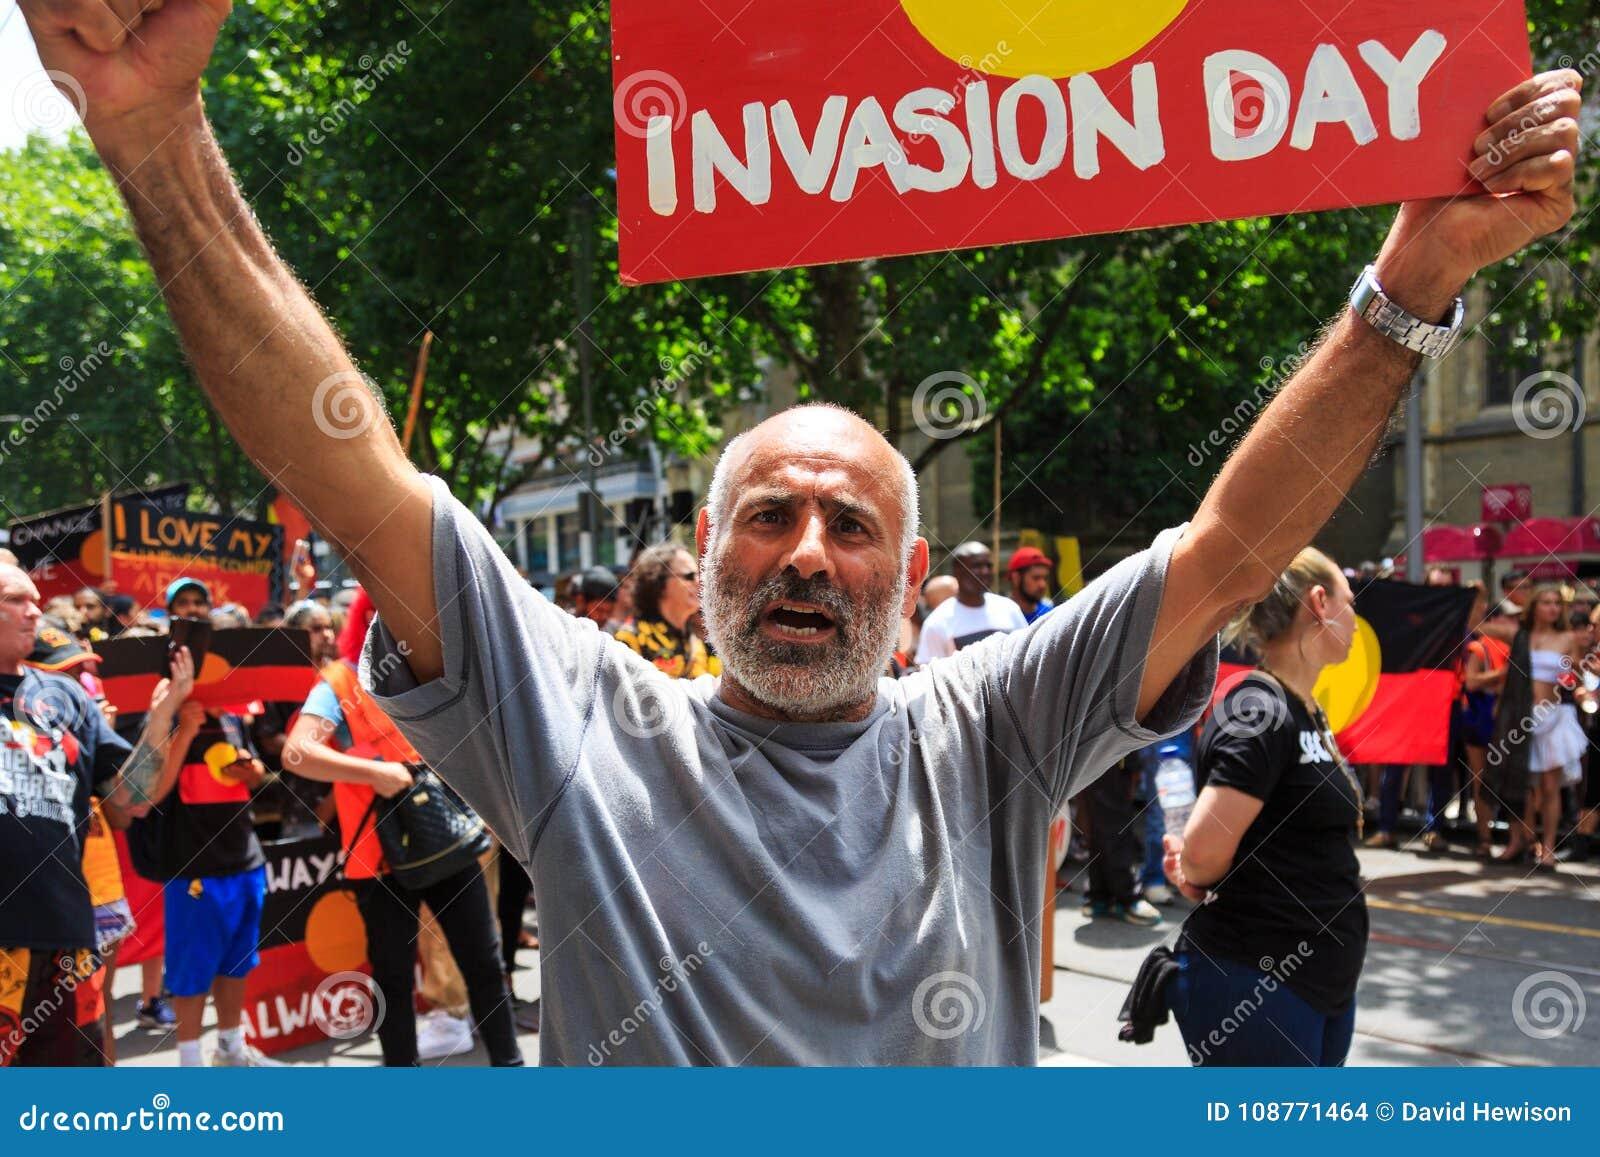 Invasion Day Australia Day Protests in Melbourne